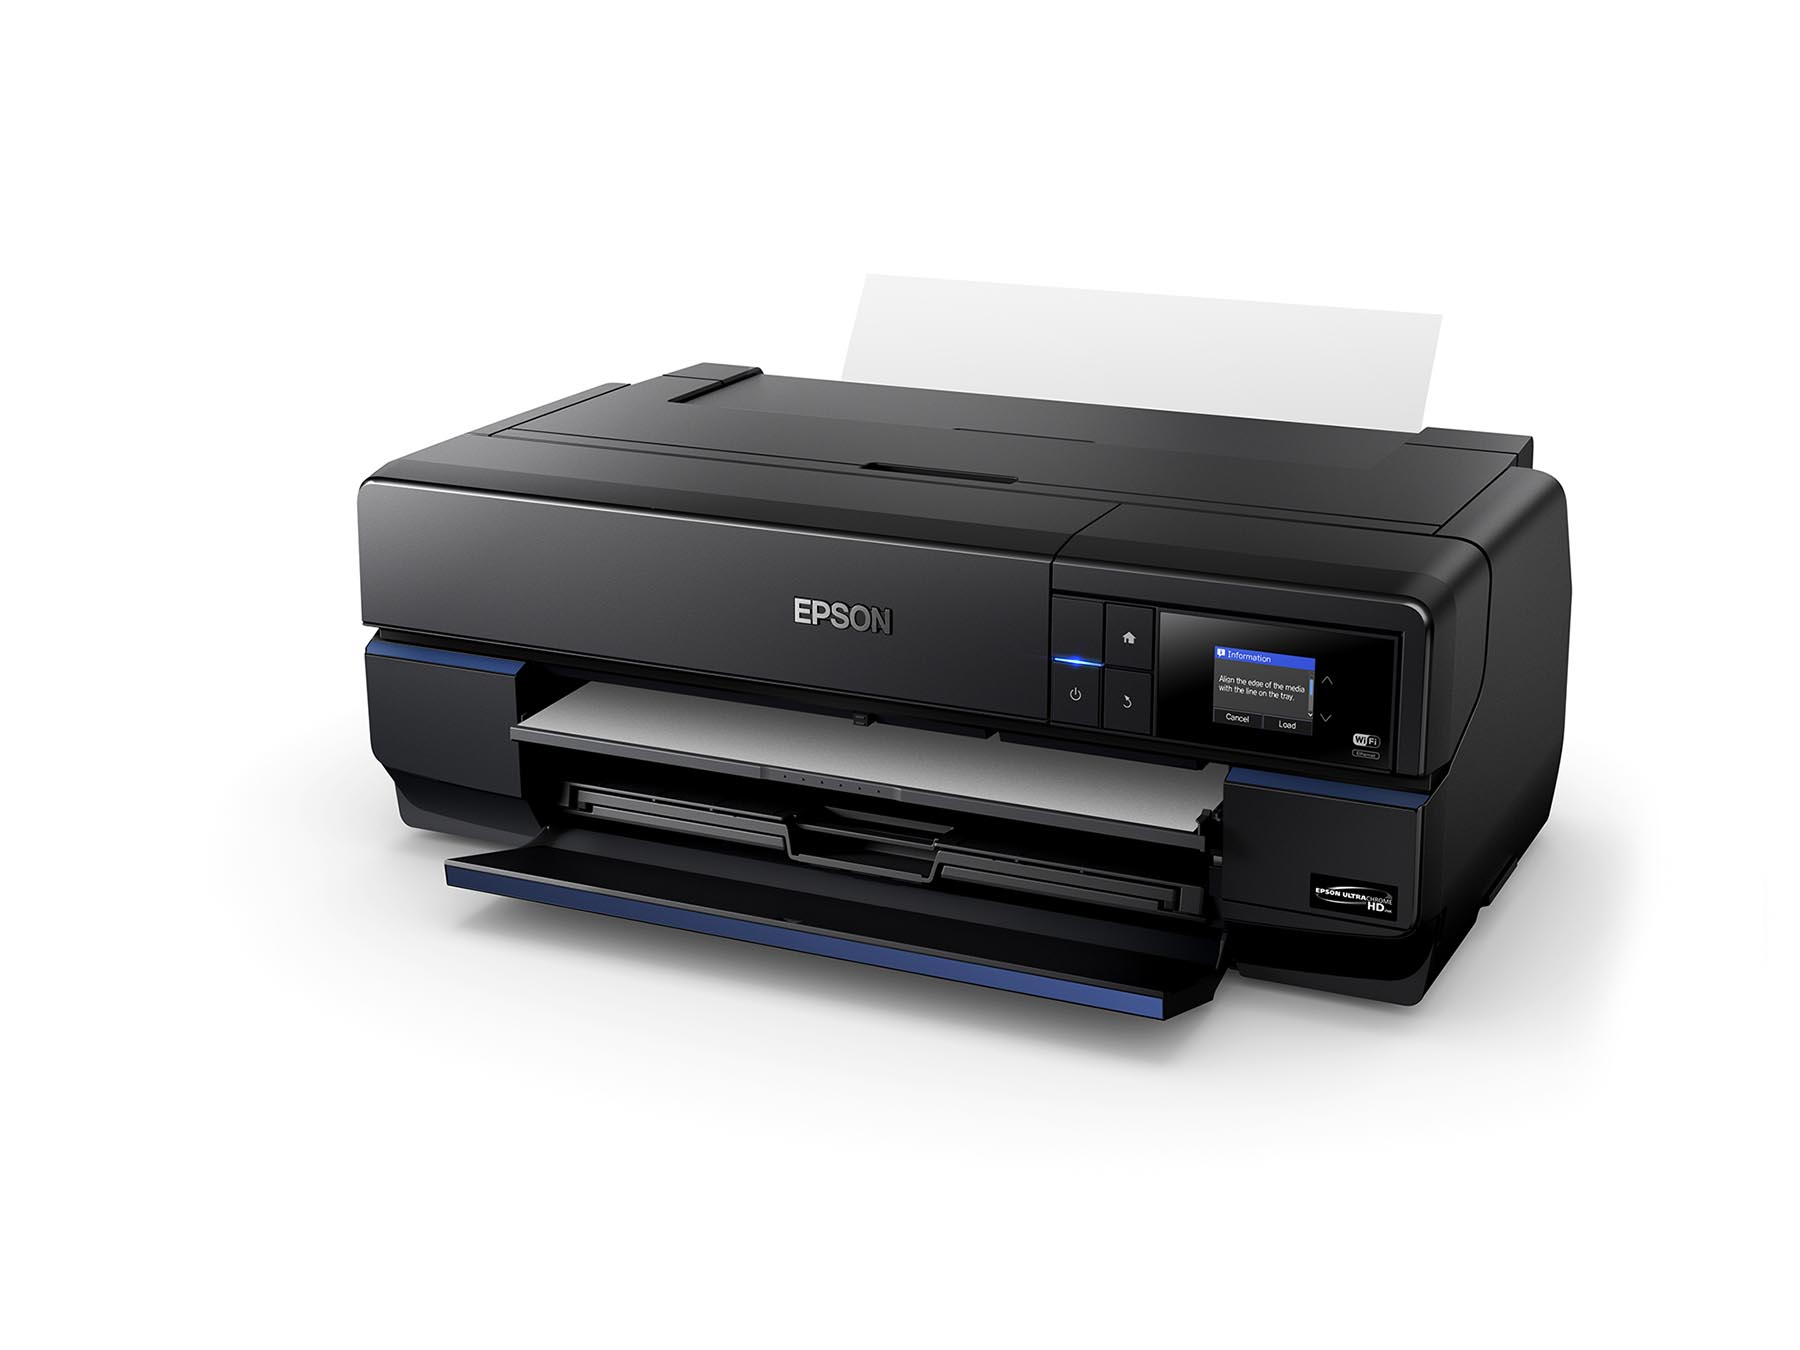 Epson SureColor P800 Design Edition Printer (SCP800DES)